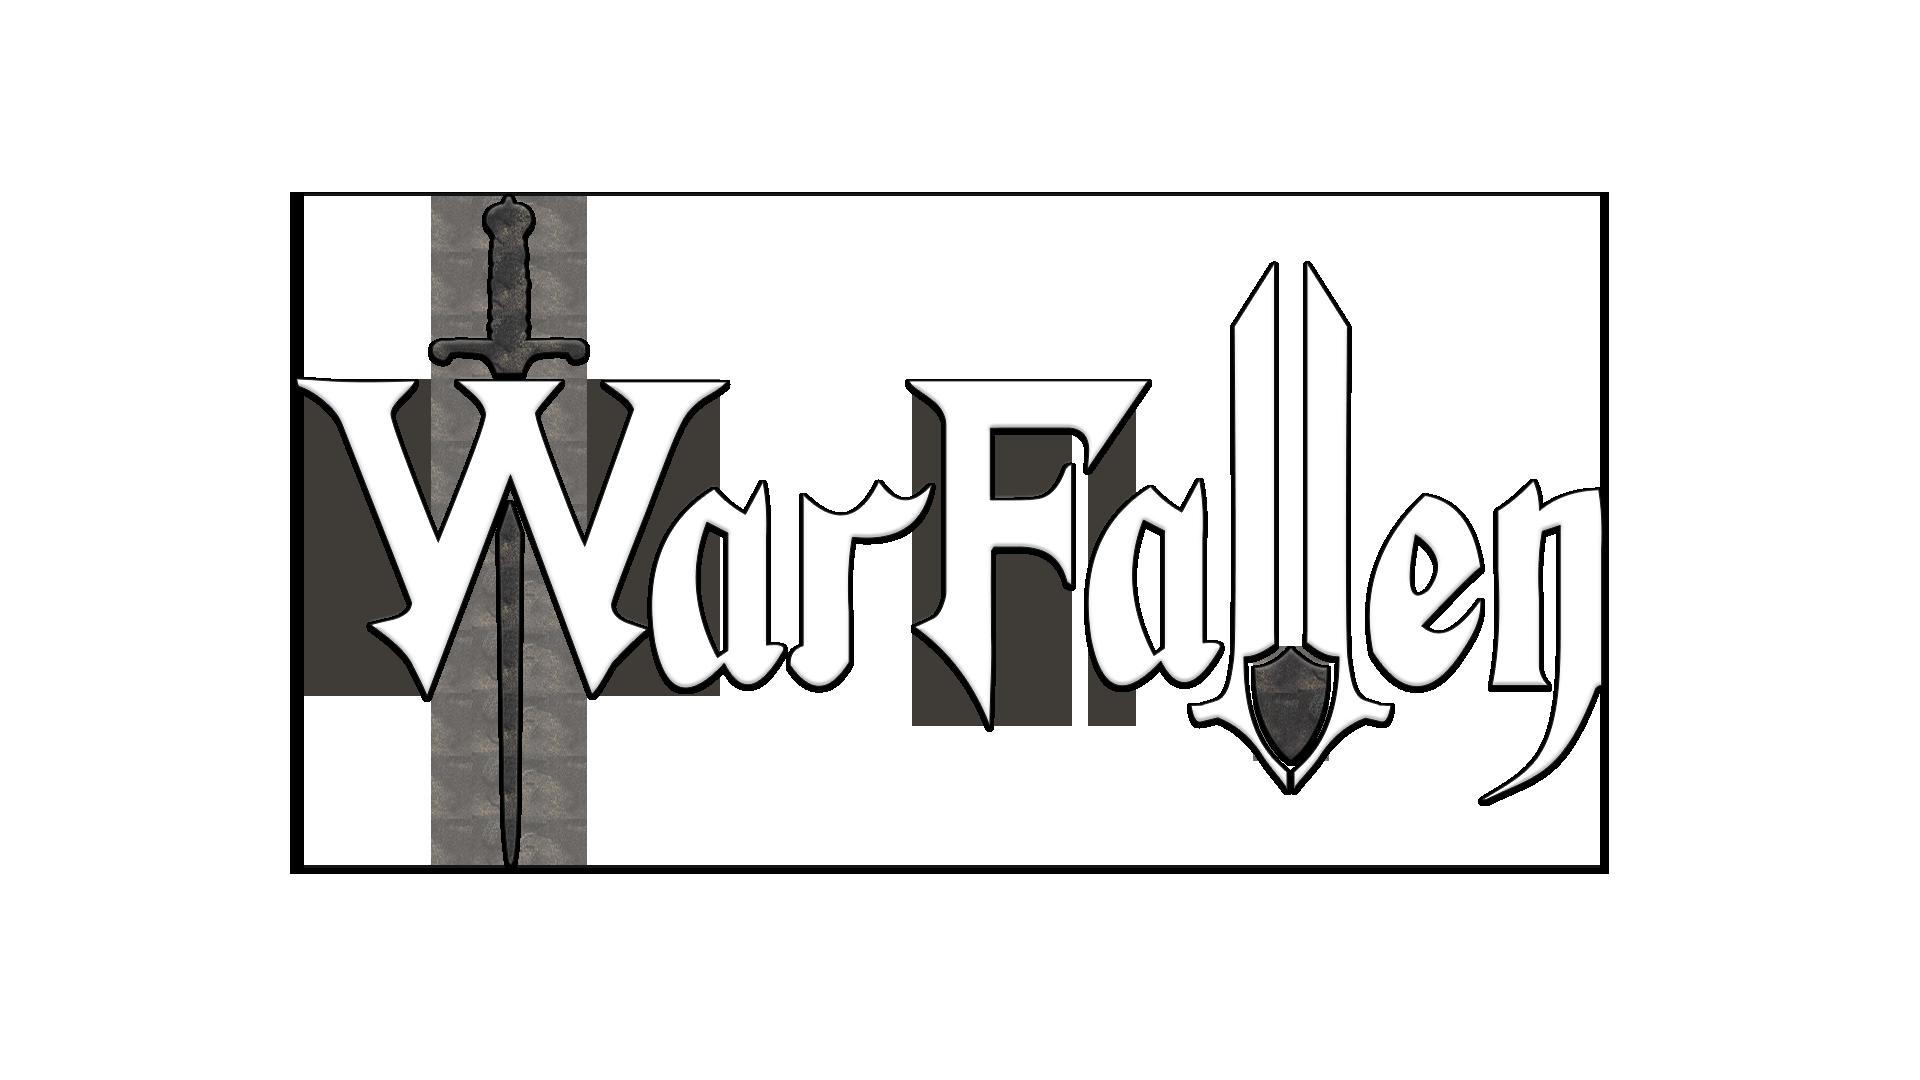 warfallen logo raised